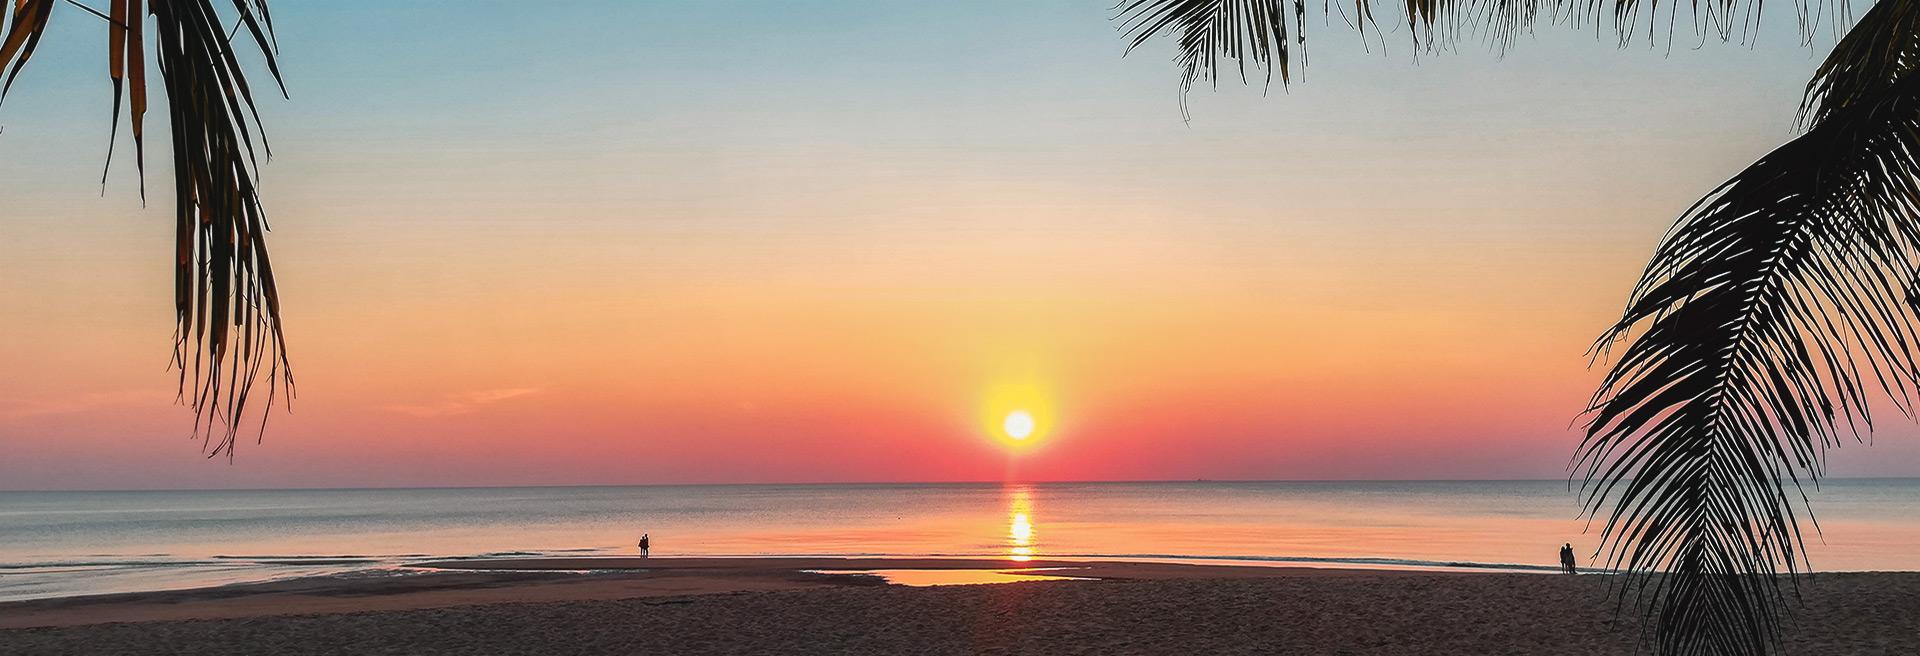 Reise Dich frei • Khao Lak Urlaub